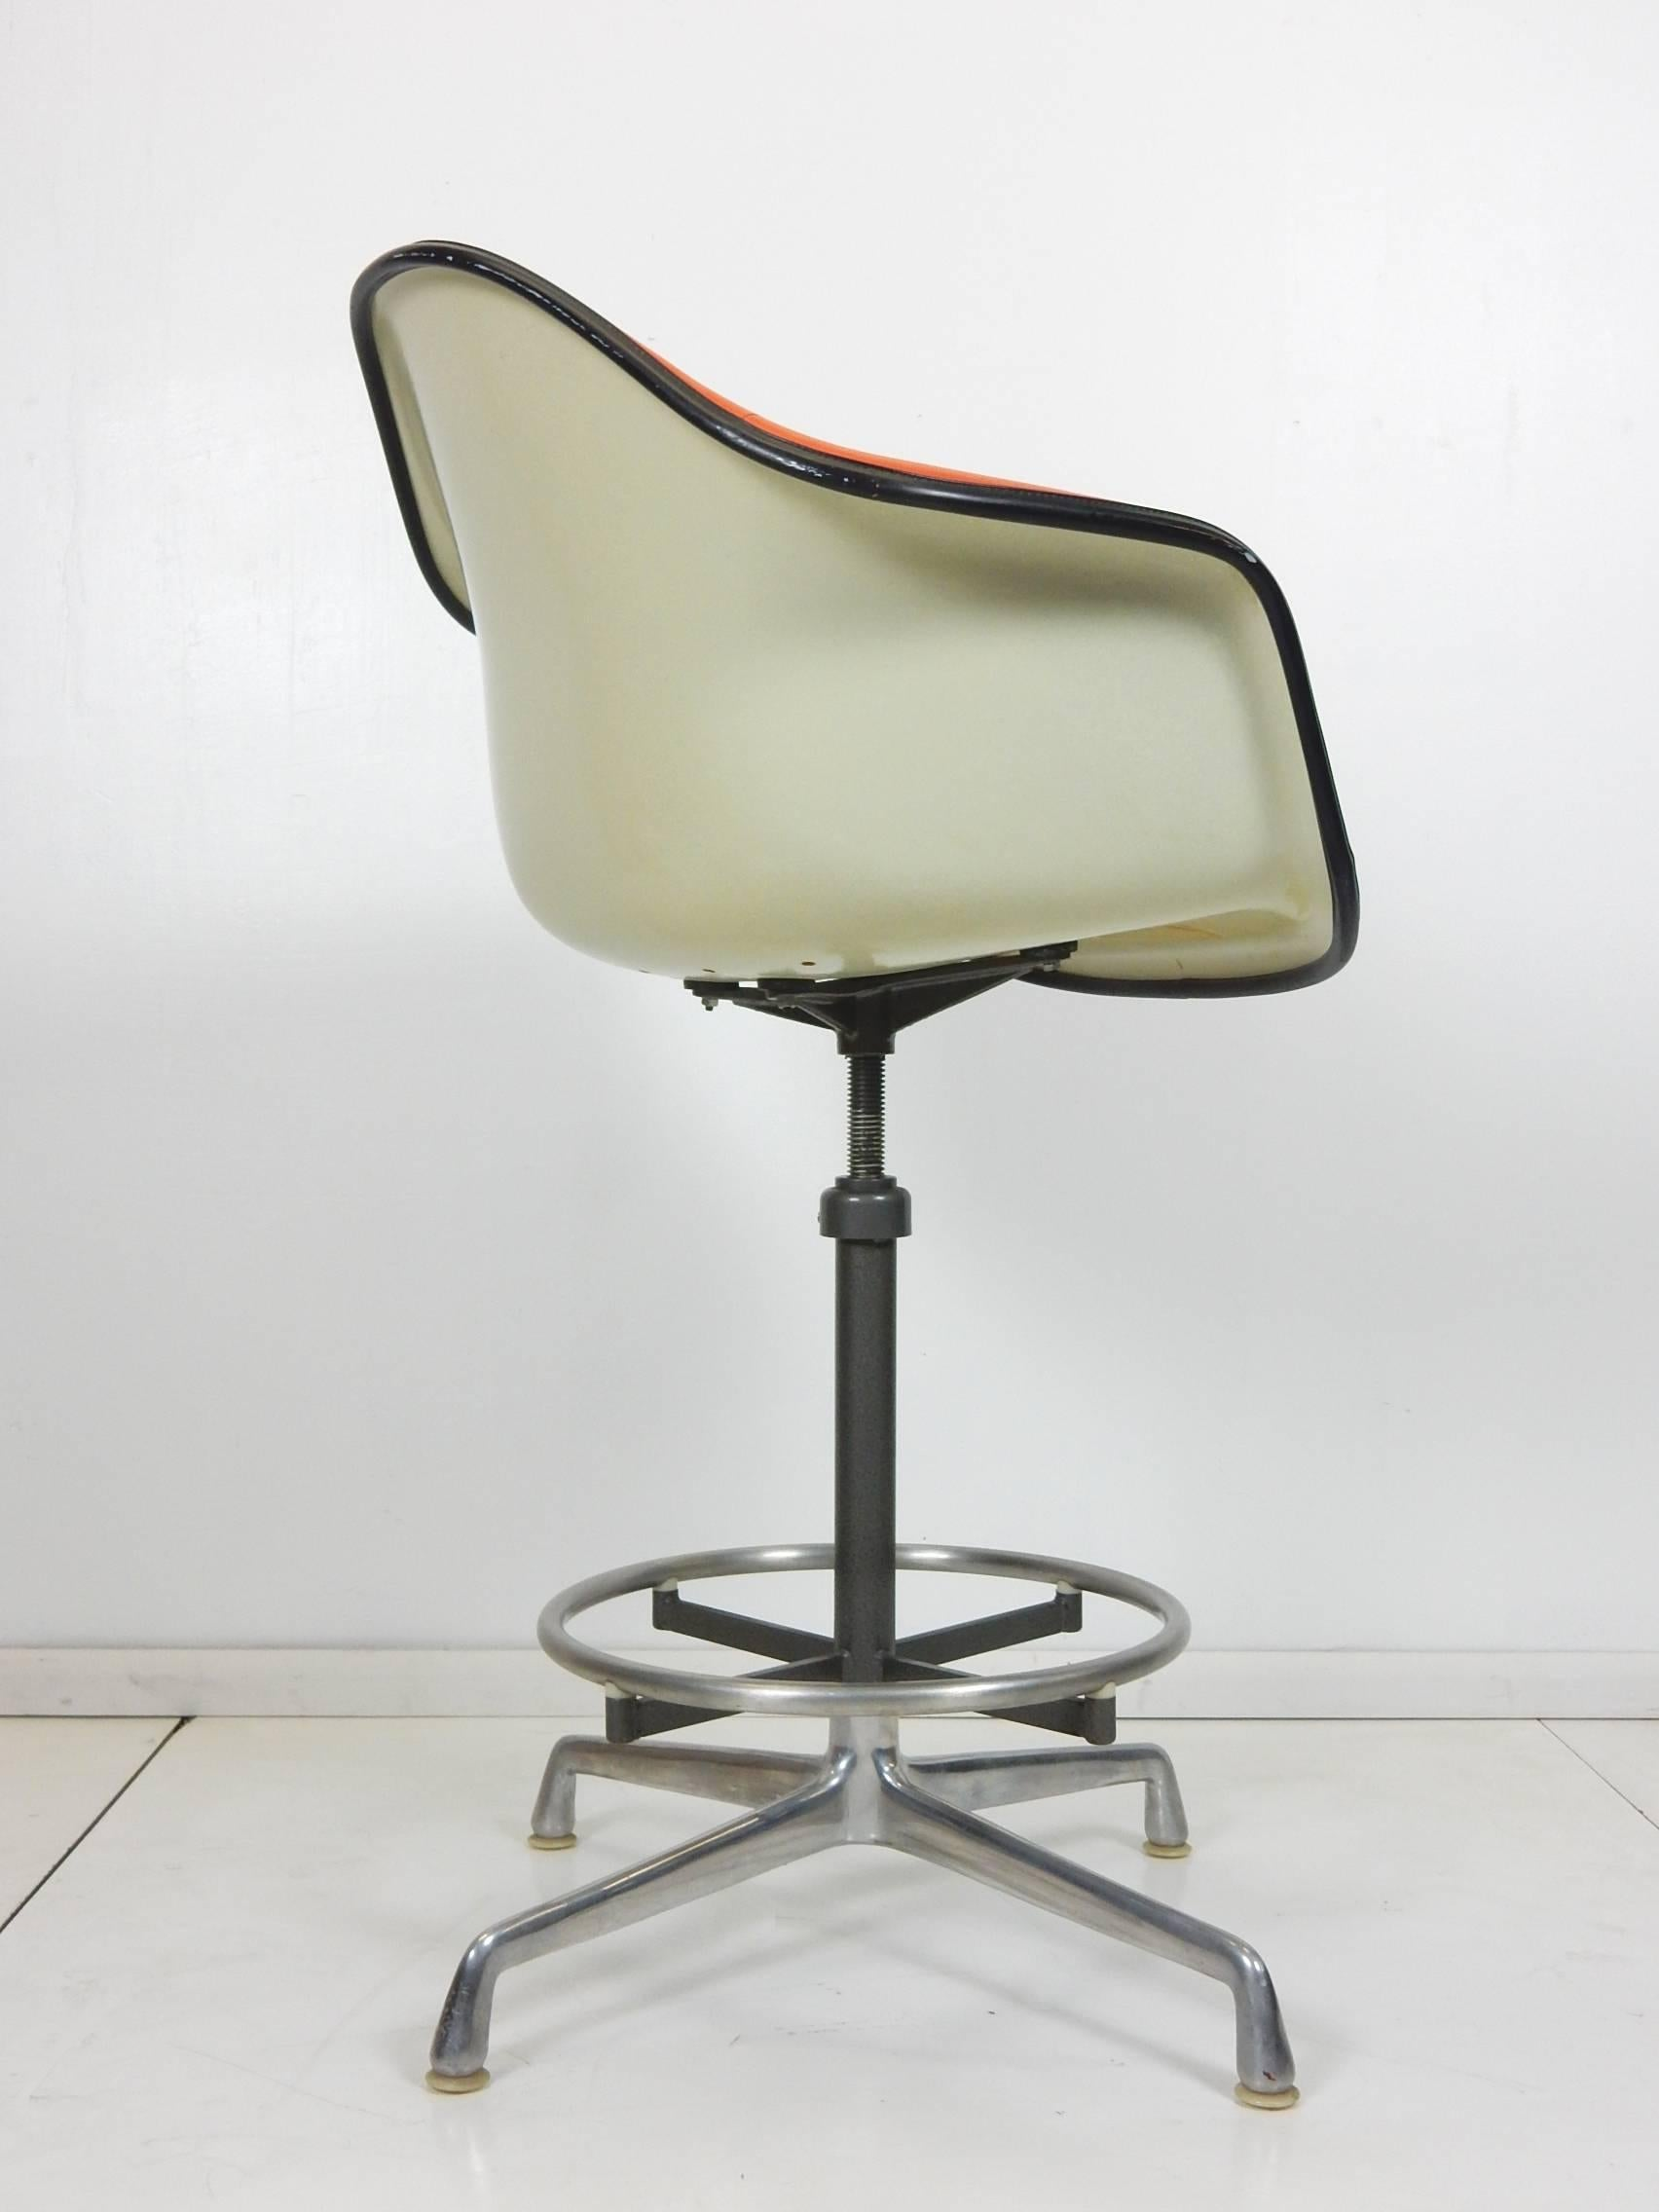 modern drafting chair beach patio cushions charles eames for herman miller orange ec 118 arm shell mid century